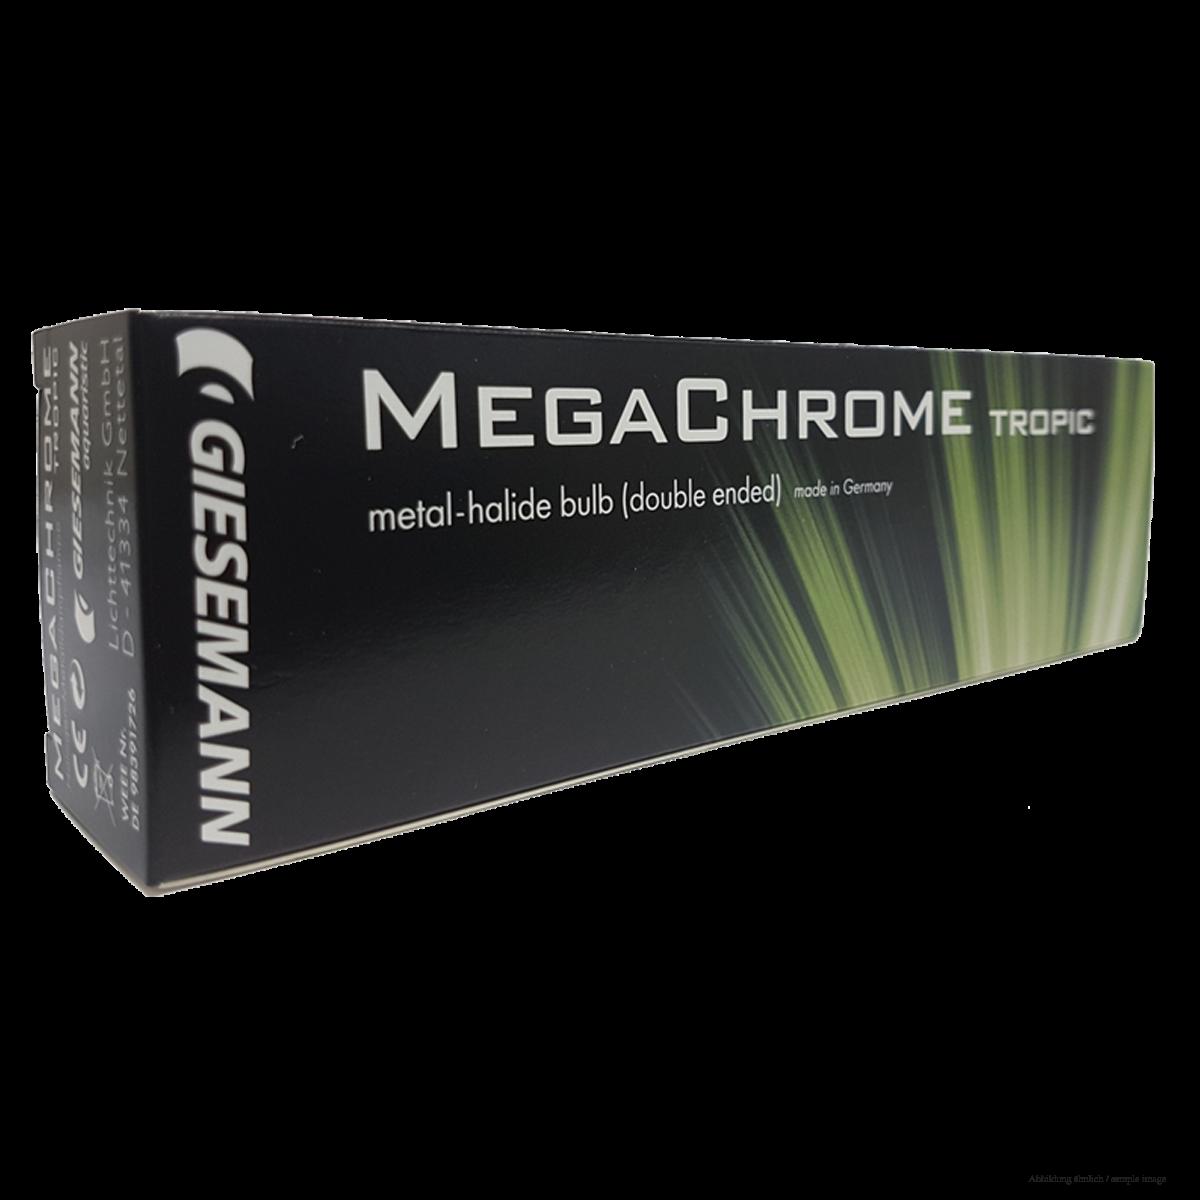 MEGACHROME Tropic TS